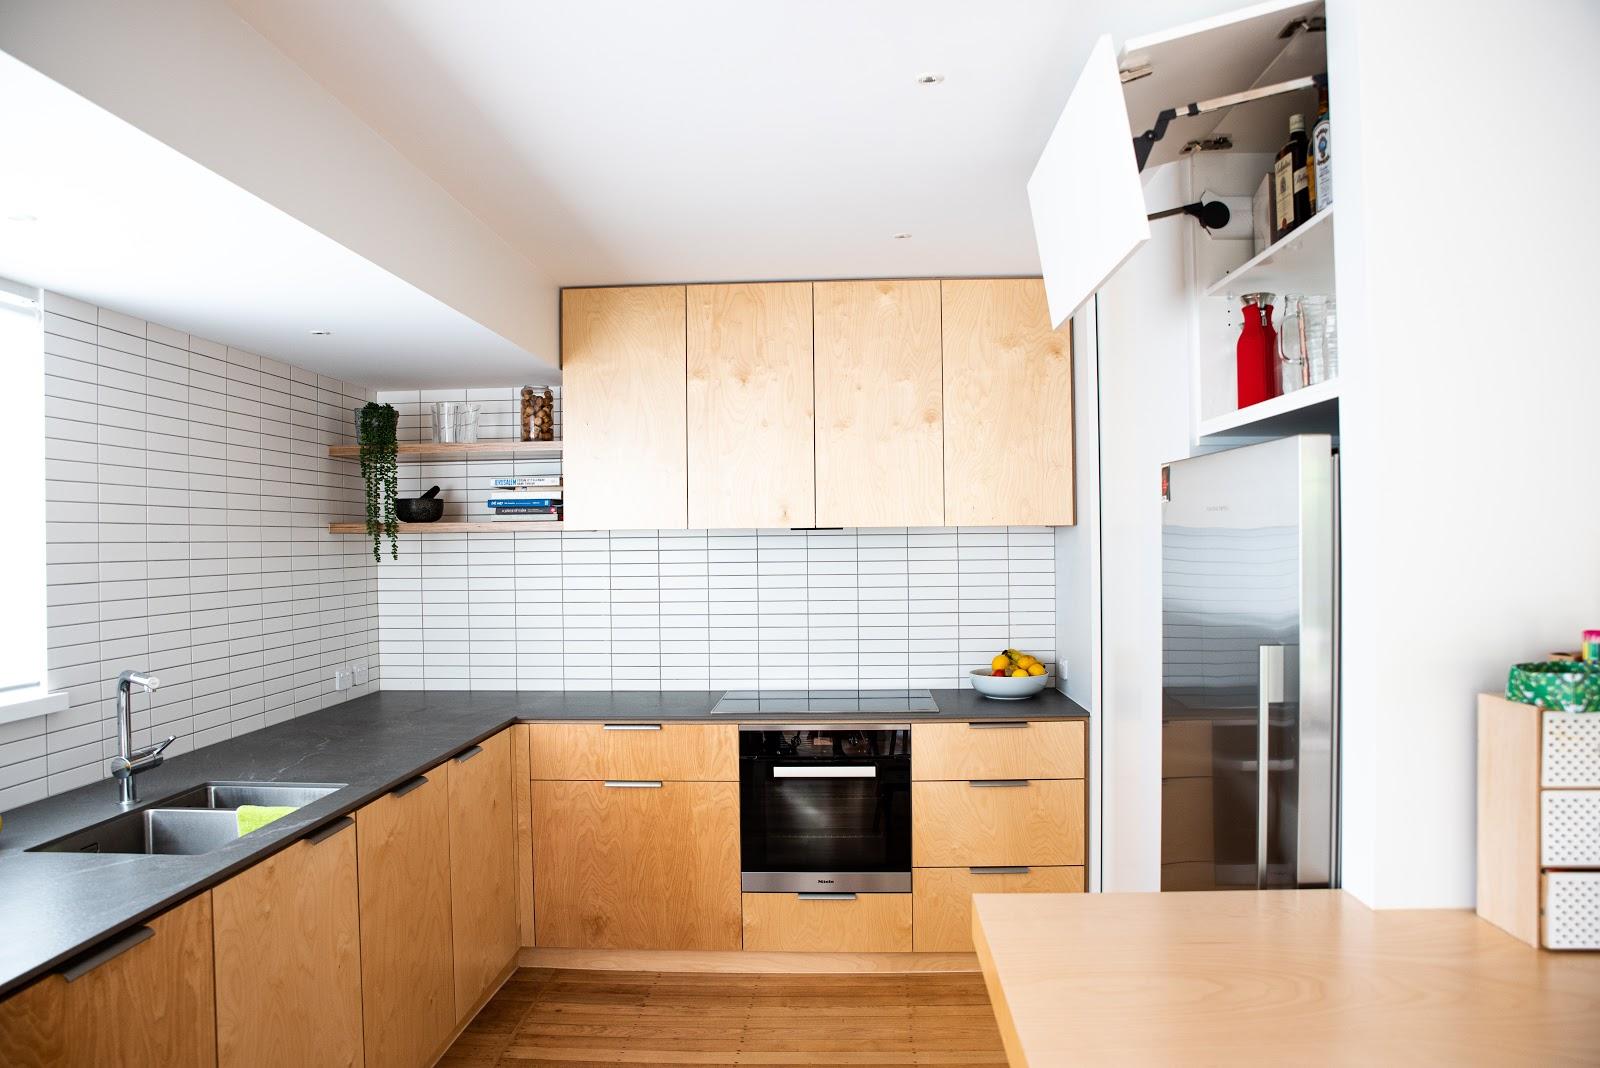 Scandi style kitchen